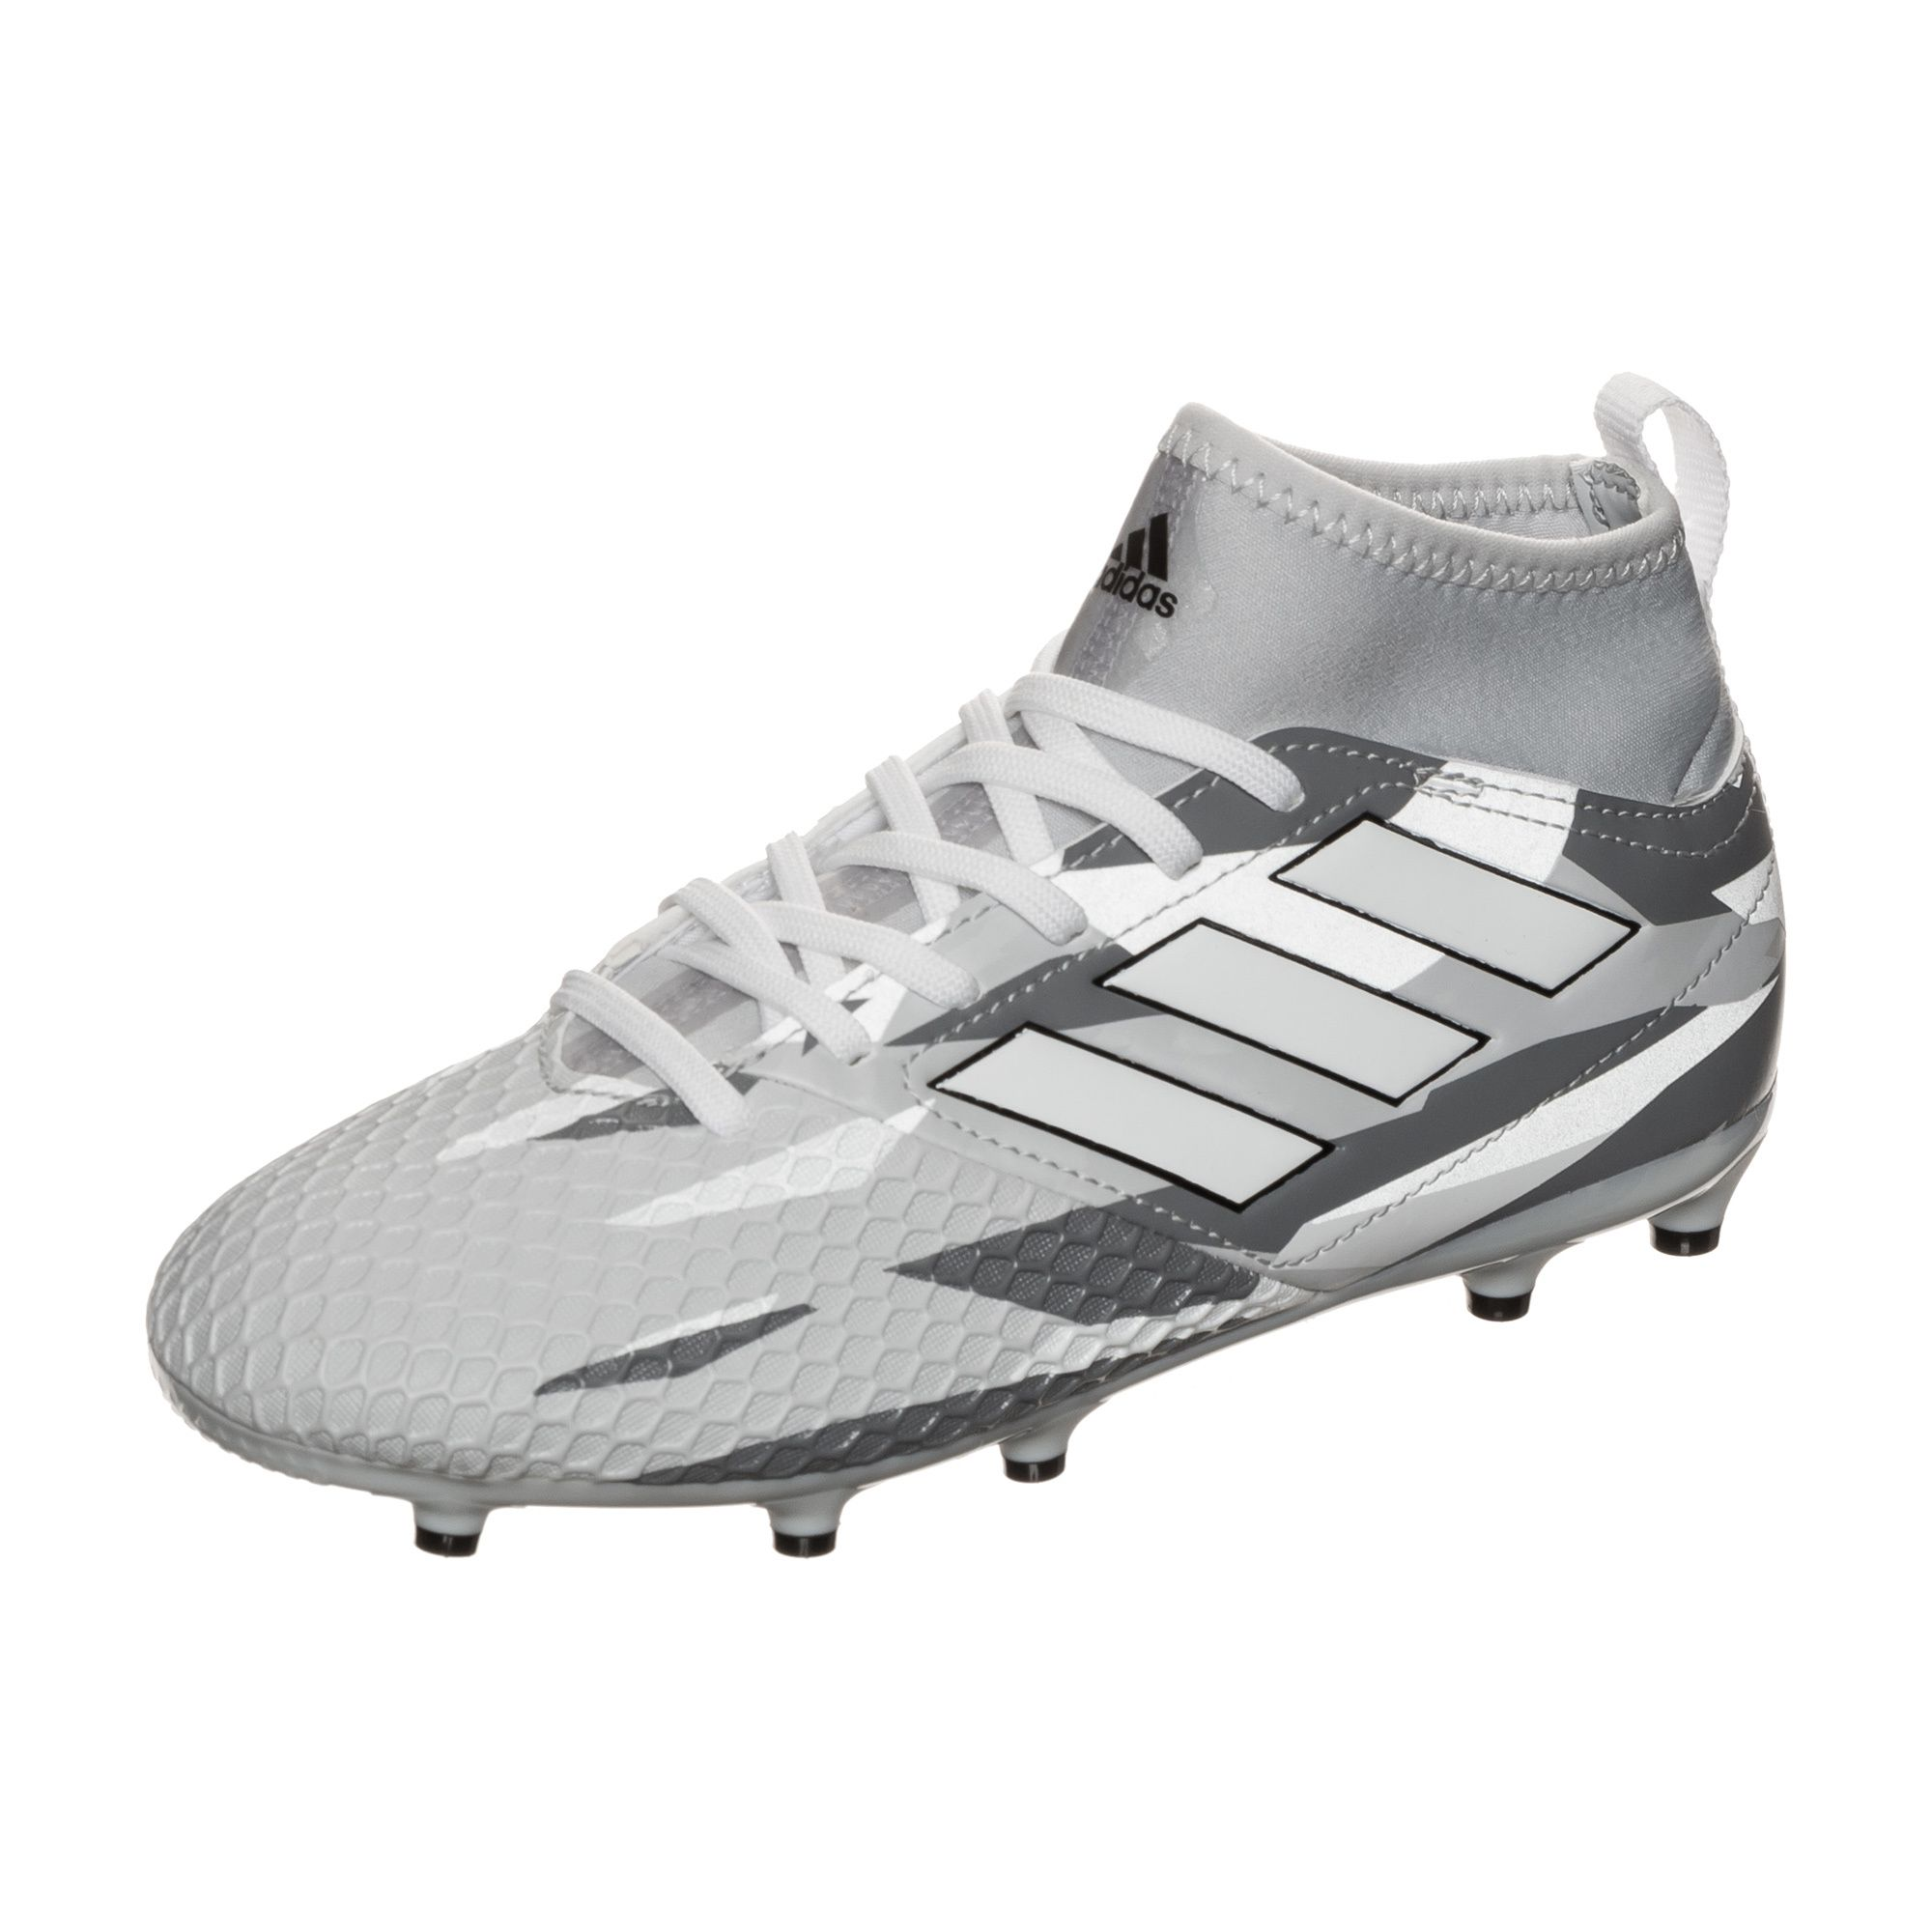 ADIDAS PERFORMANCE adidas Performance ACE 17.3 FG Fußballschuh Kinder